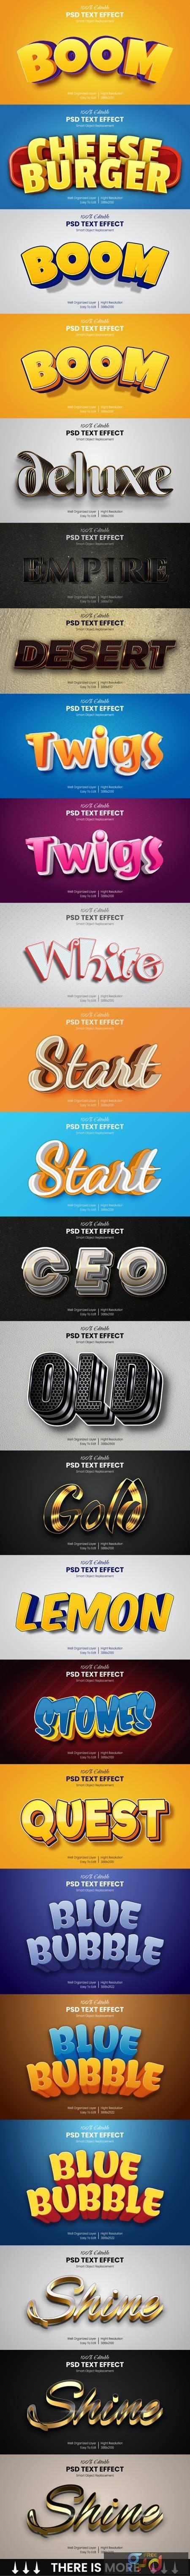 40 Luxury & Cartoon Photoshop Text Effects - Golden & Comic Styles 29800611 1